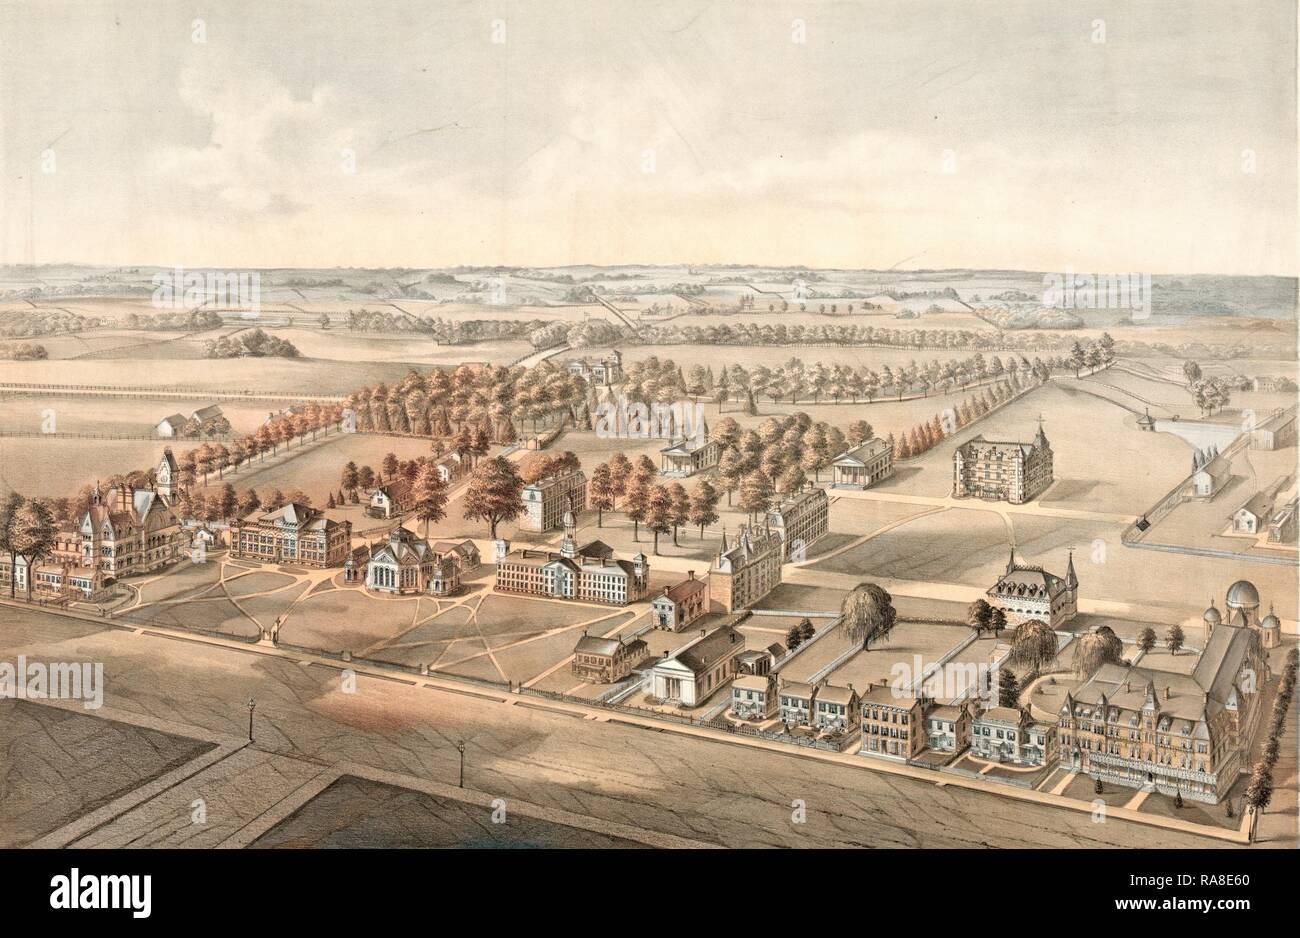 Princeton College, Princeton, N.J. Designed by W.M. Radcliff, Lith., Circa 1875, US, USA, America. Reimagined - Stock Image